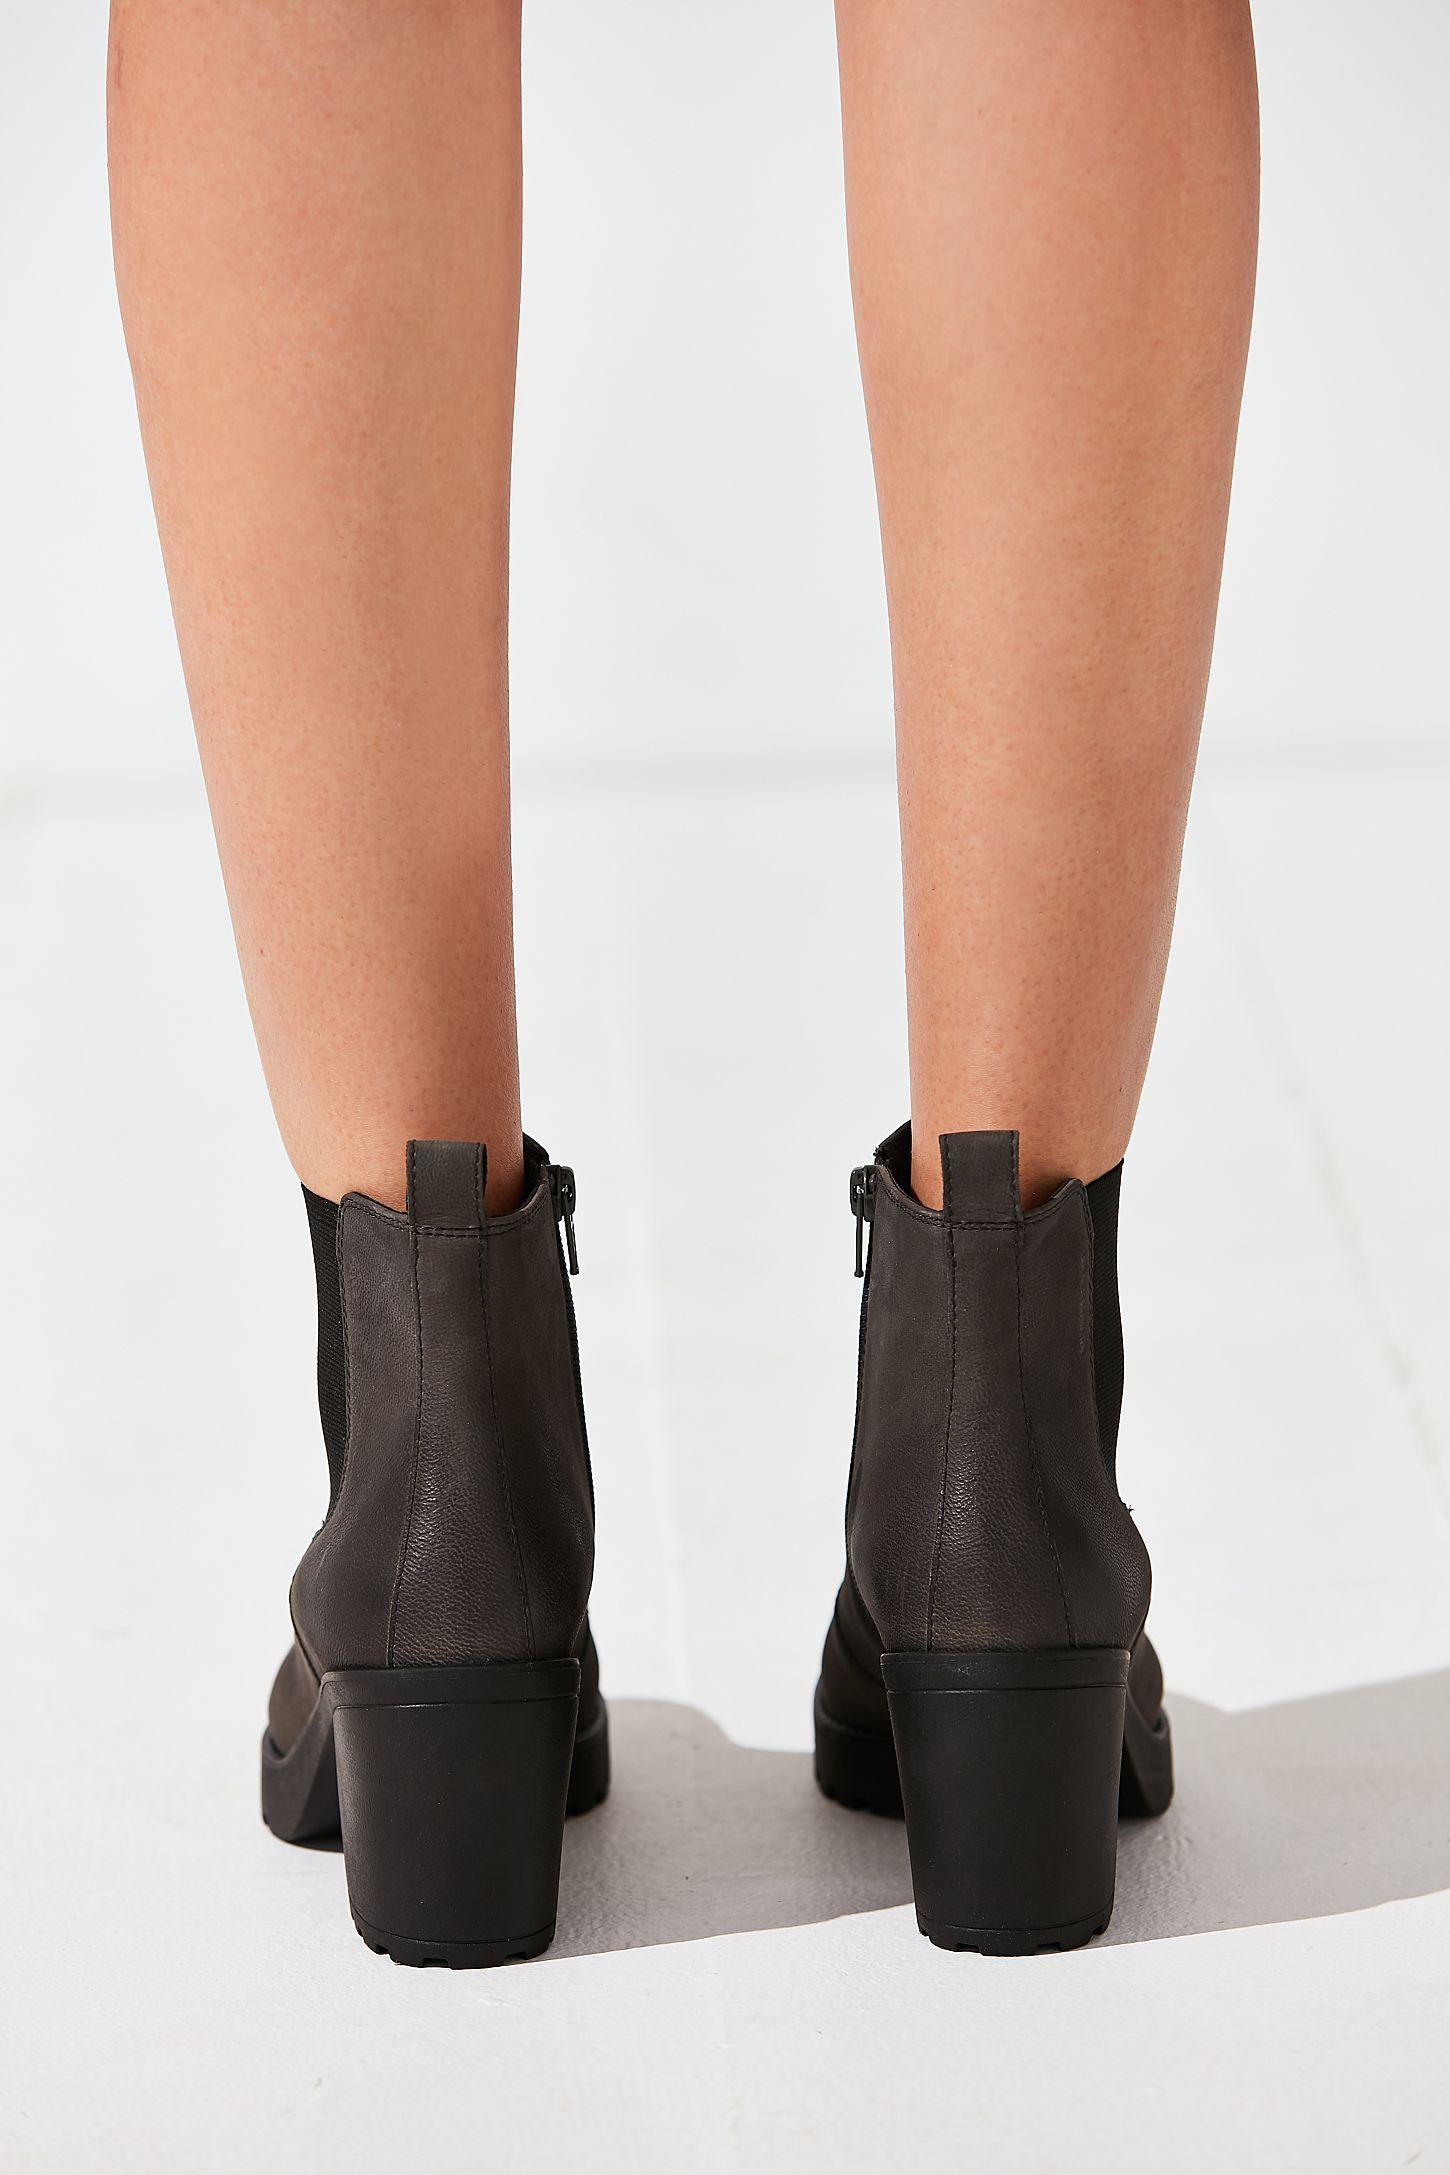 604aa880661db6 Slide View  6  Vagabond Shoemakers Grace Platform Ankle Boot